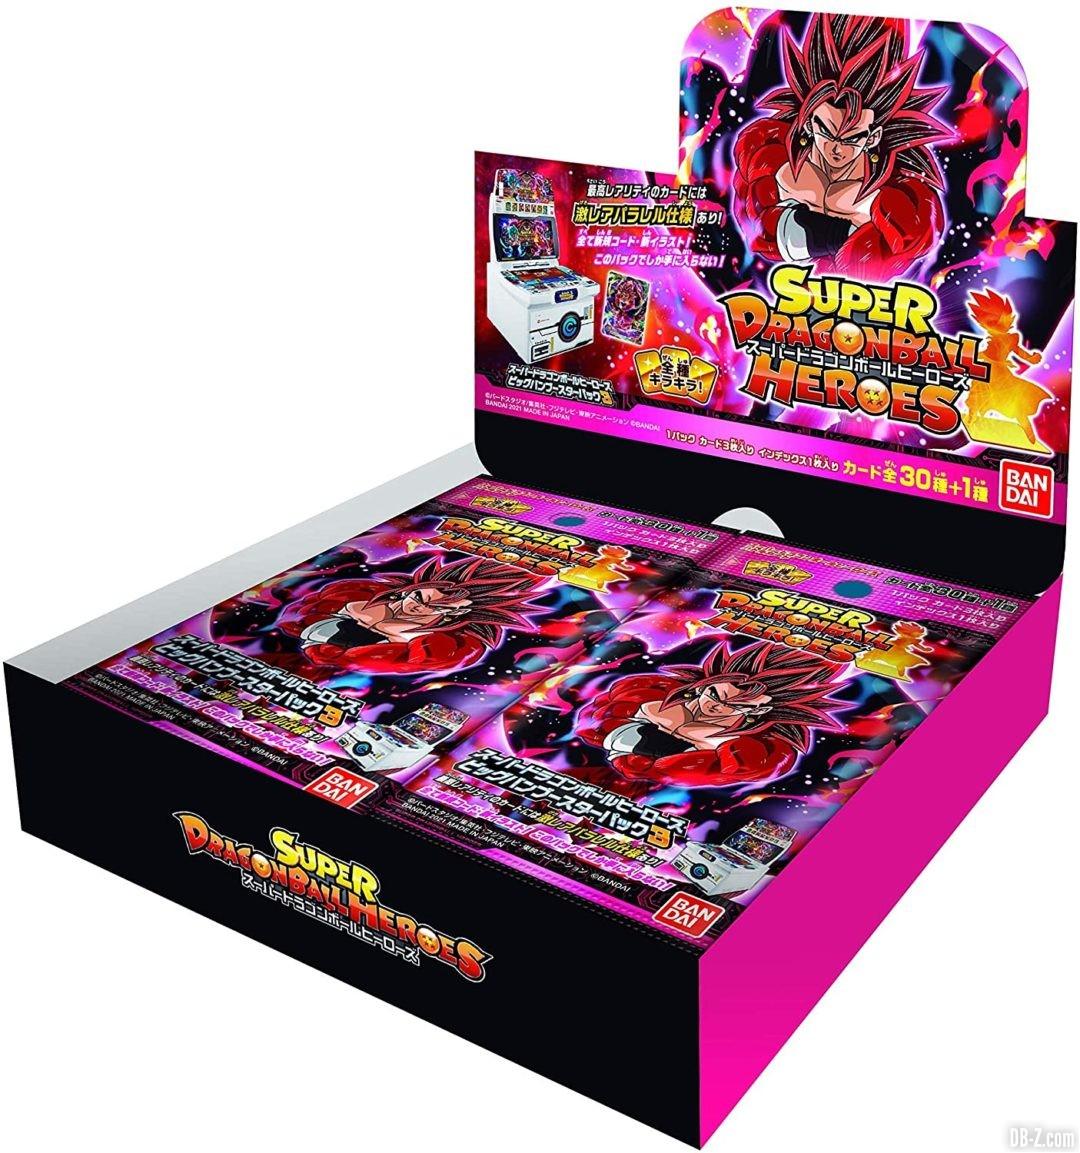 Super-Dragon-Ball-Heroes-Big-Bang-Booster-Pack-3